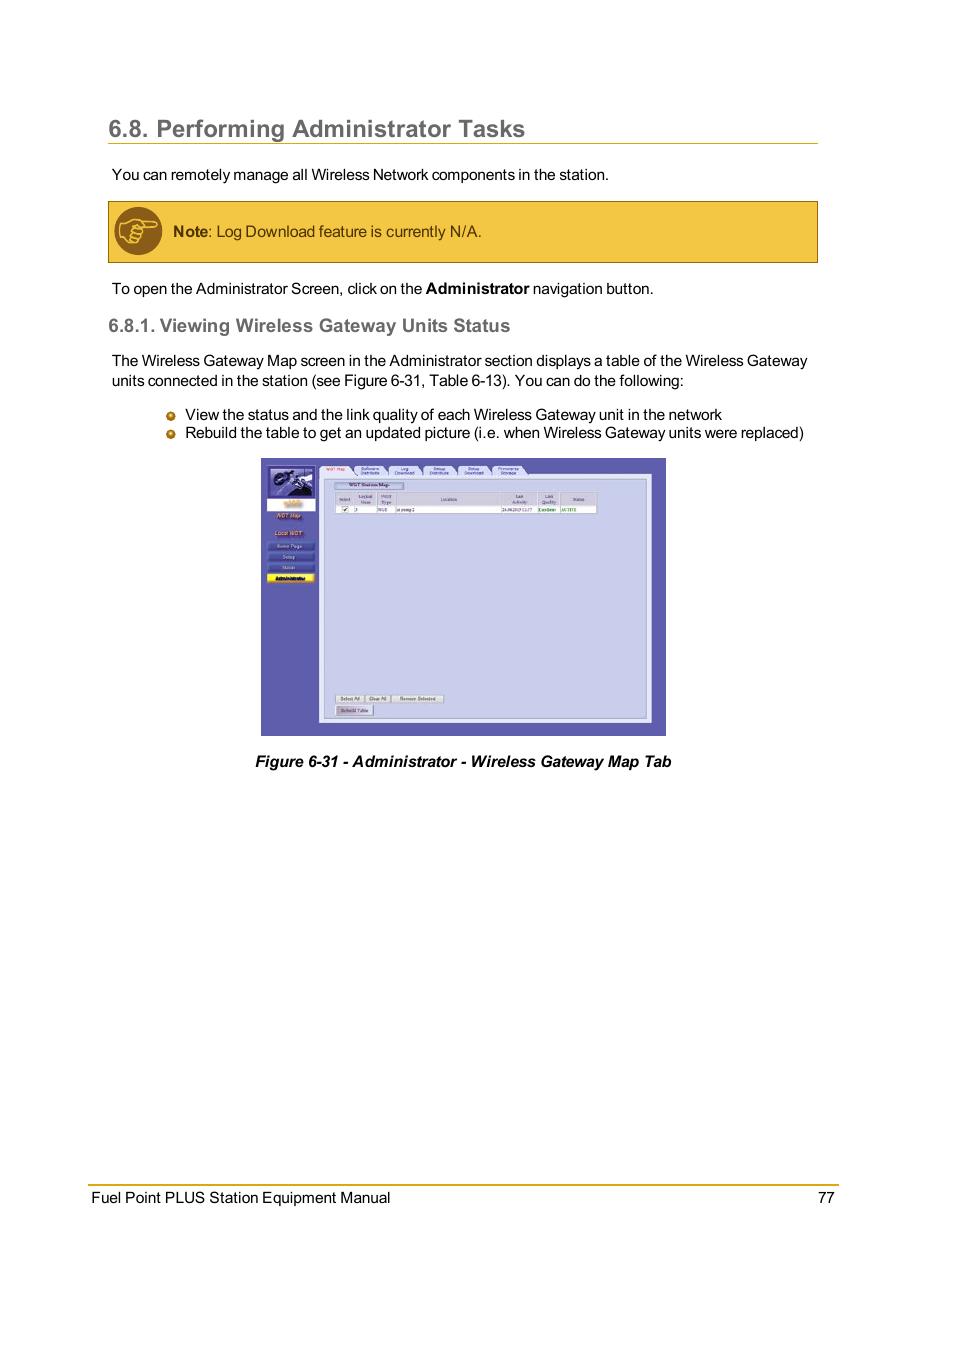 smart wireless gateway manual emerson process management Array - performing  administrator tasks viewing wireless gateway units rh manualsdir com